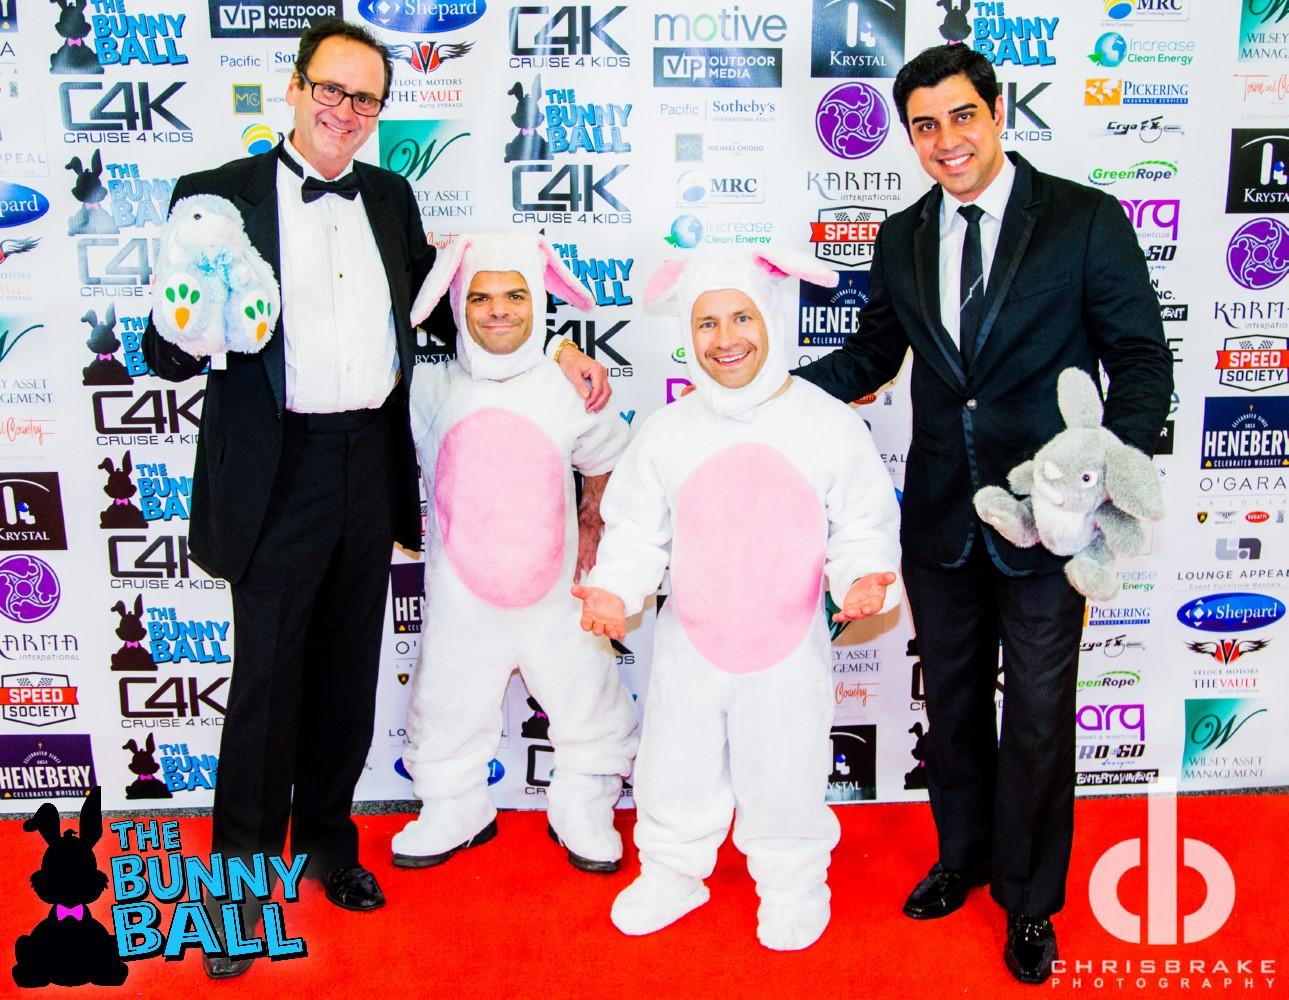 Bunny-Ball-2018-Chris-Brake- 90.jpg